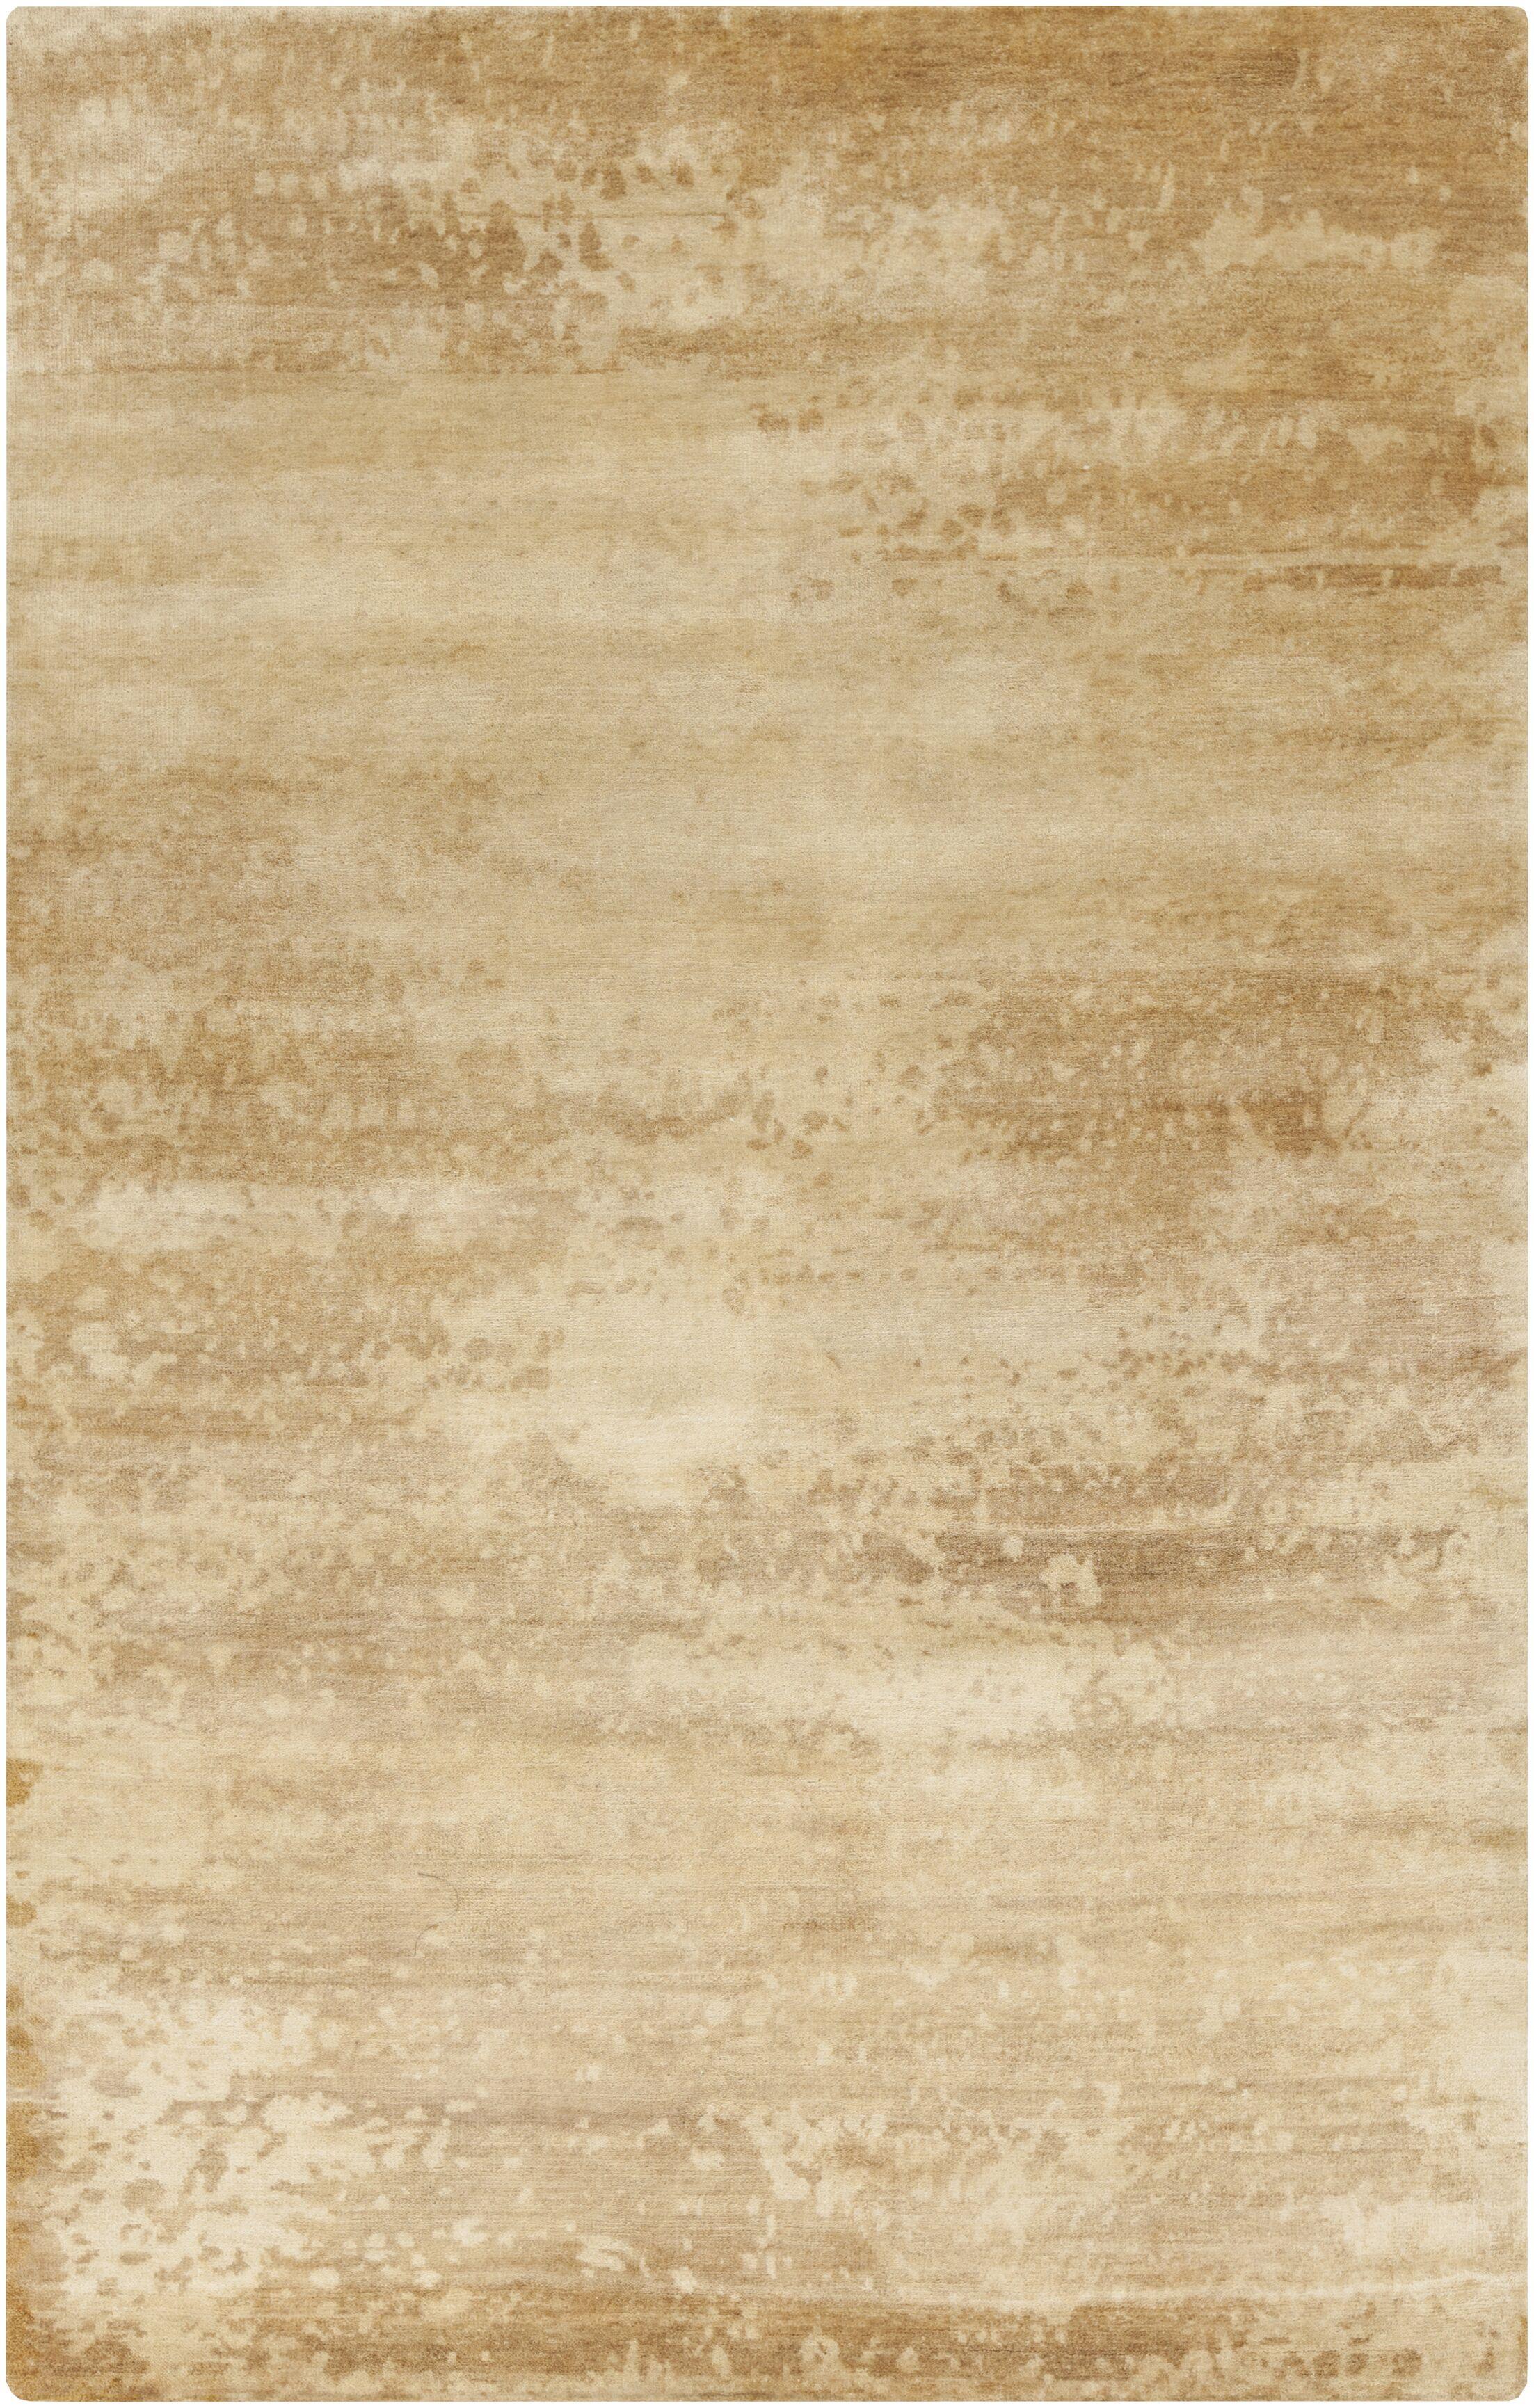 Chane Hand-Knotted Tan/Khaki Area Rug Rug Size: Rectangle 5' x 8'